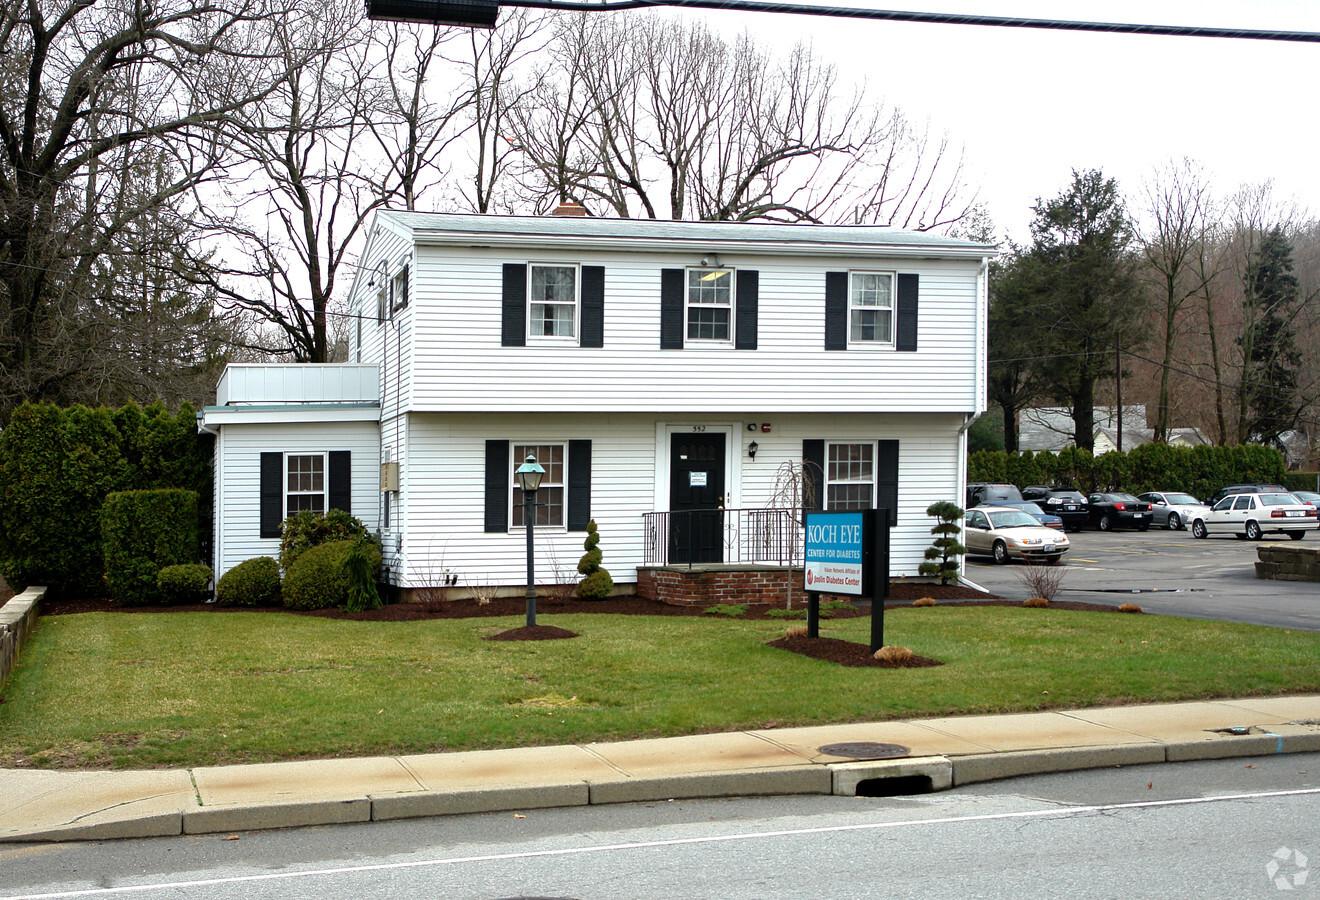 Kayaly Sober House │ Level 2 │ Warwick Rhode Island